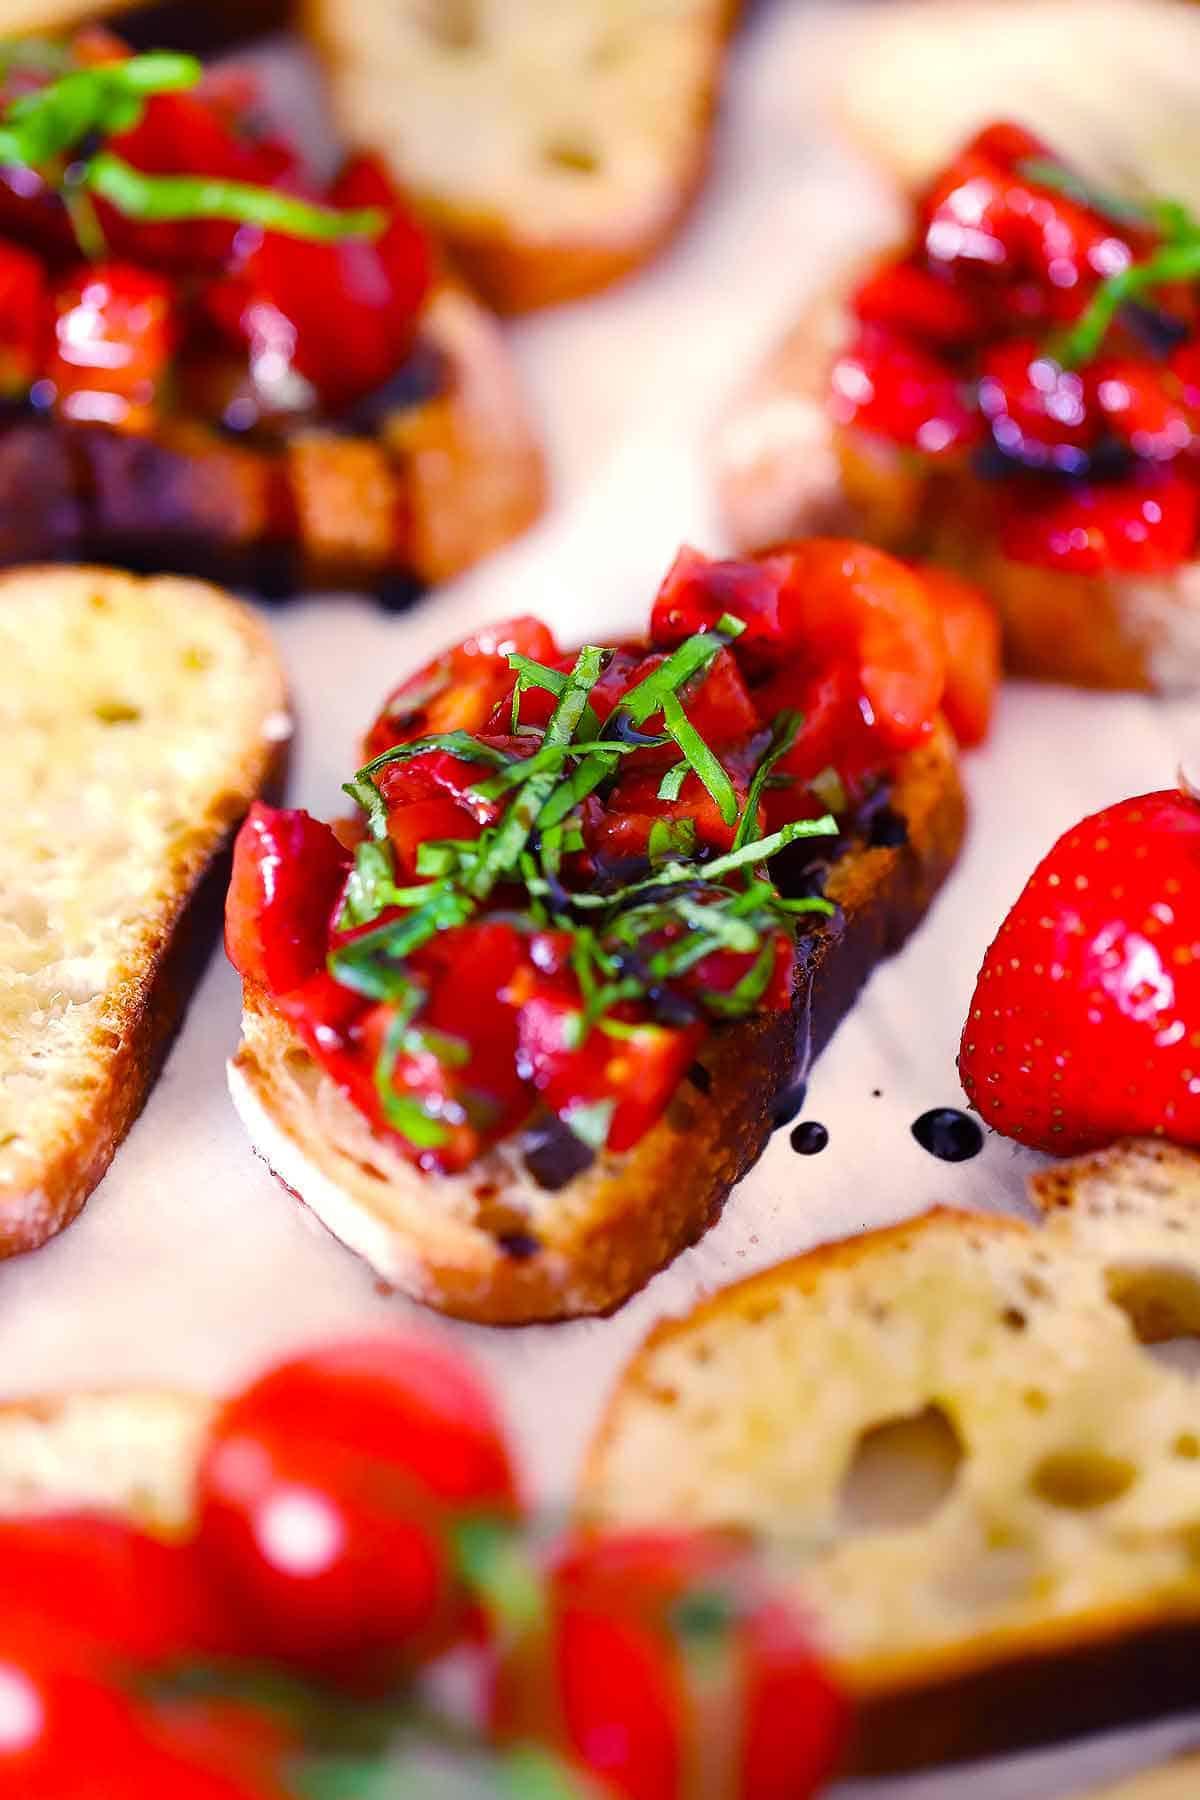 Close up photo of a crostini topped with strawberry bruschetta, balsamic glaze, and fresh basil.